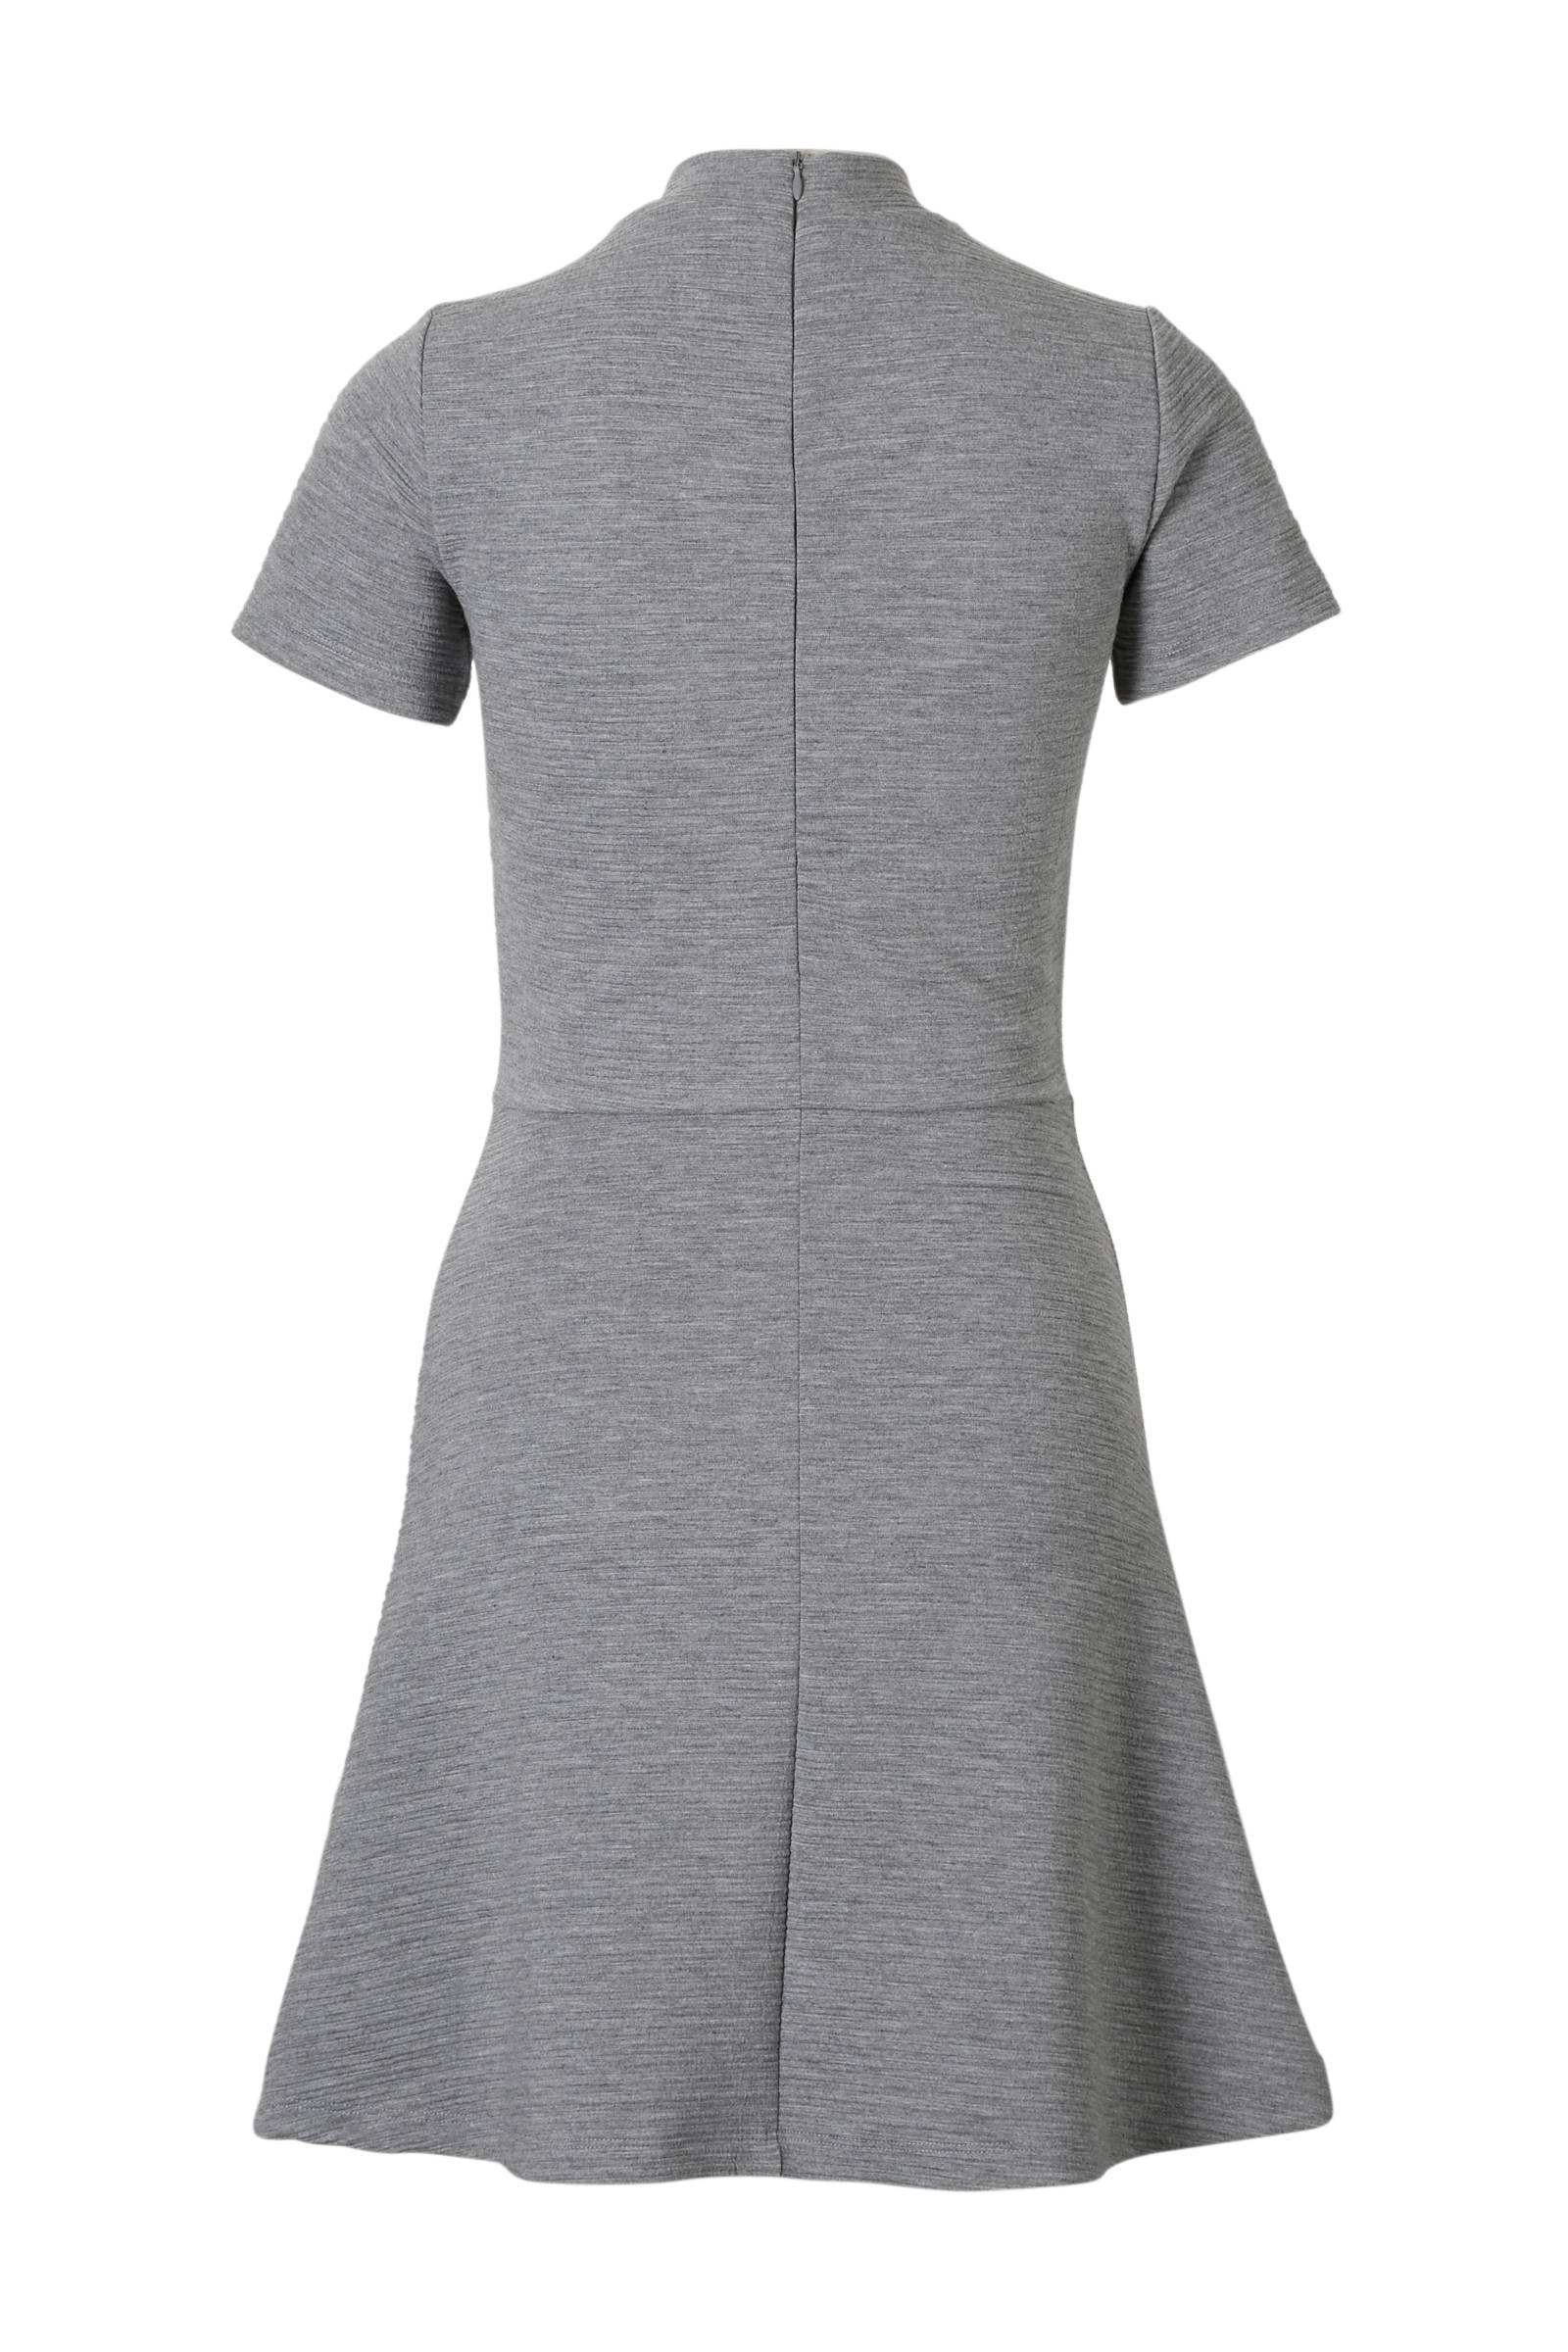 Nanette Nanette Nanette Superdry Superdry Superdry jurk jurk 5zqwOST5